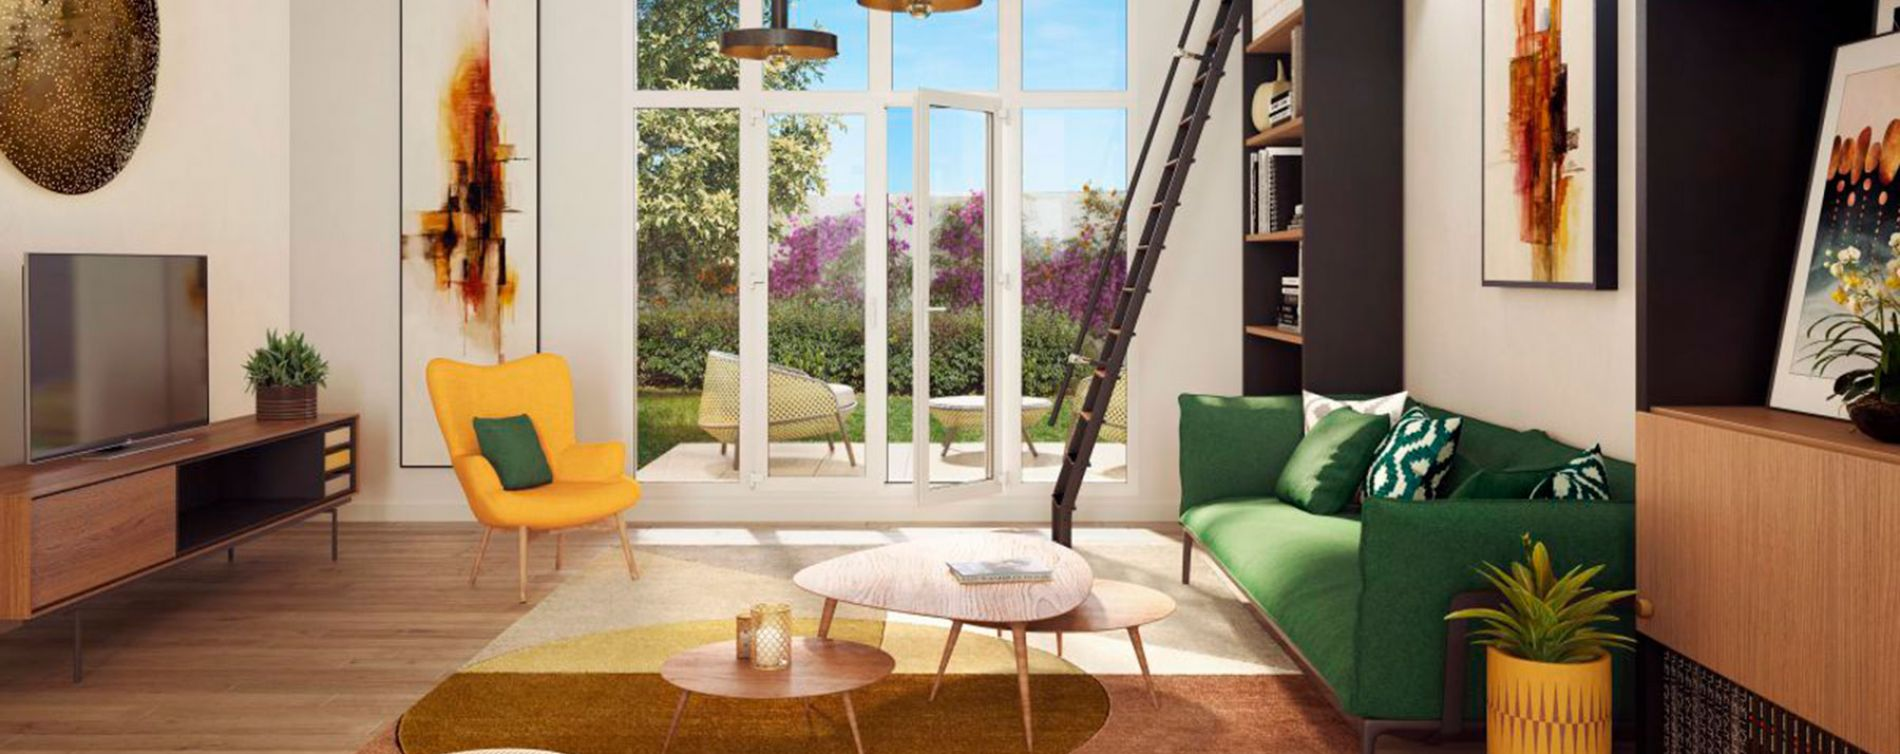 Montreuil : programme immobilier neuve « Oxygène » (3)